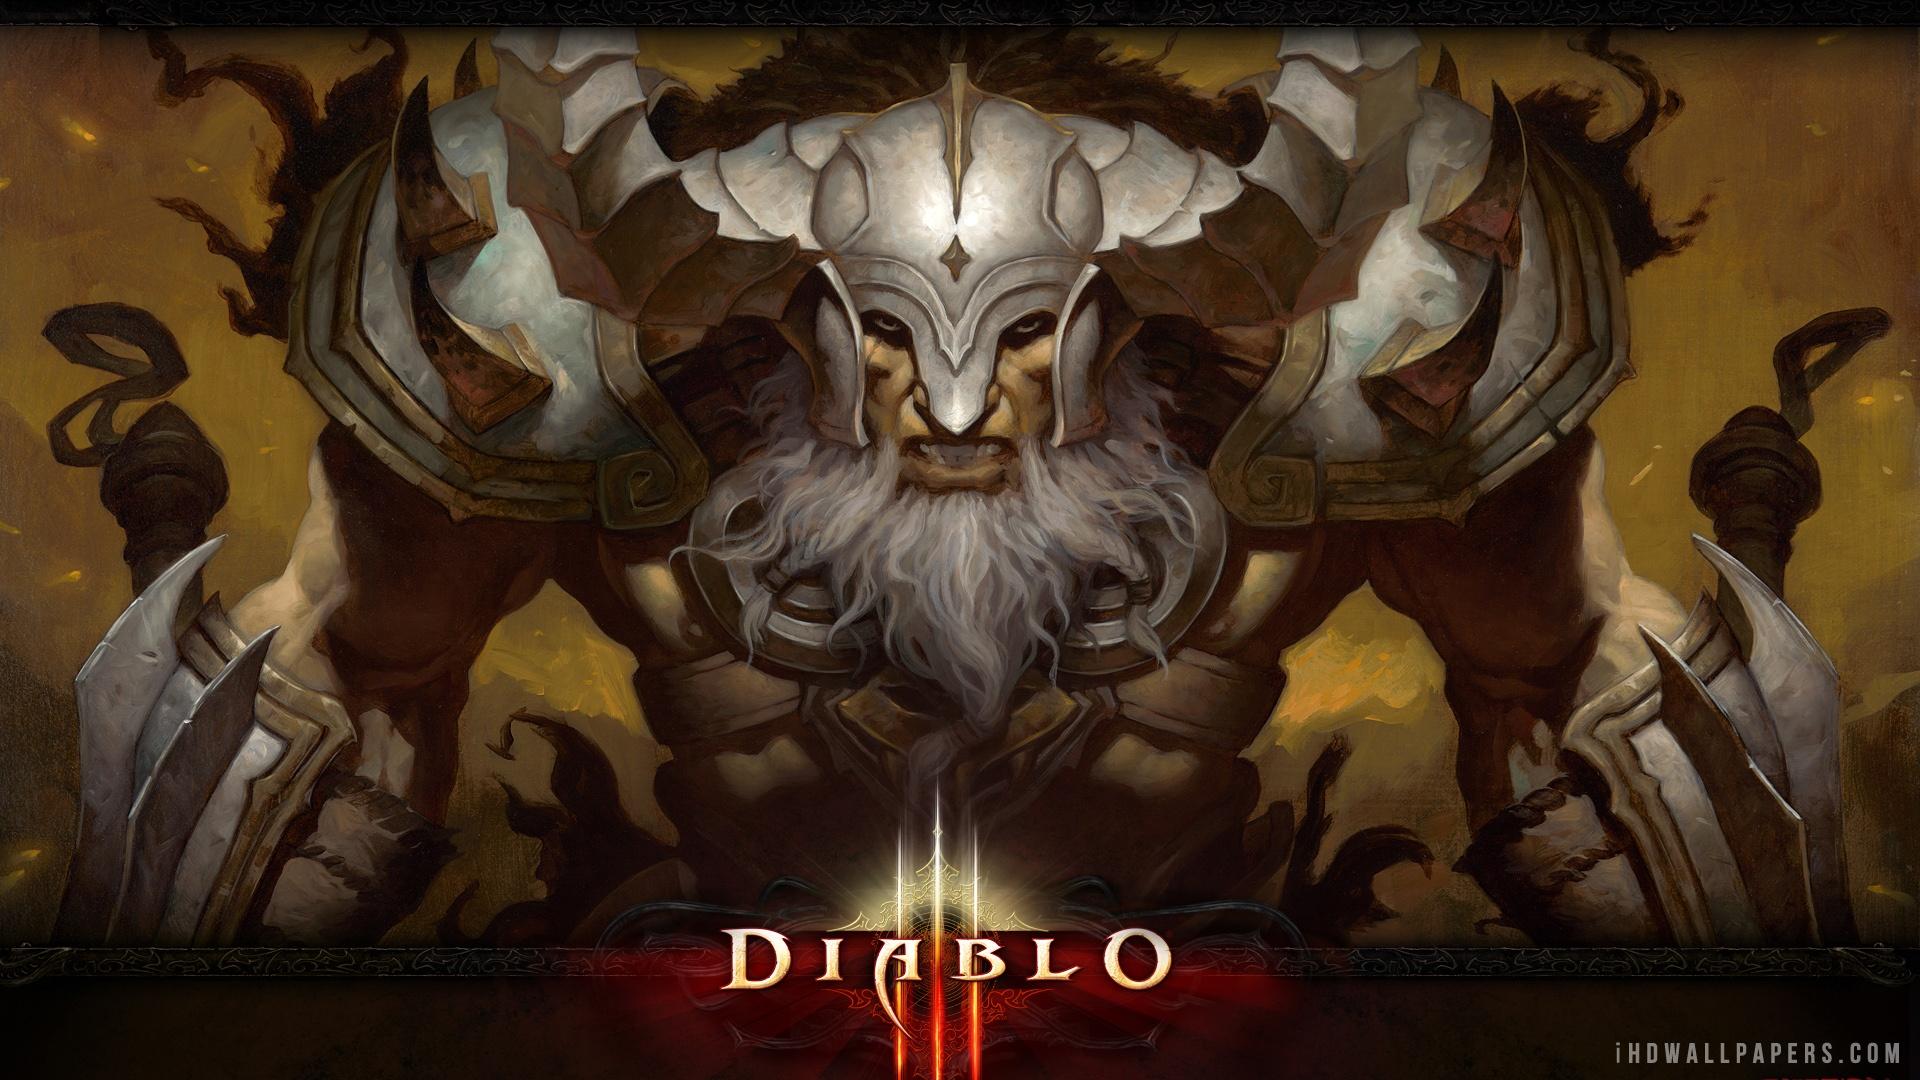 Barbarian Diablo III HD Wallpaper   iHD Wallpapers 1920x1080